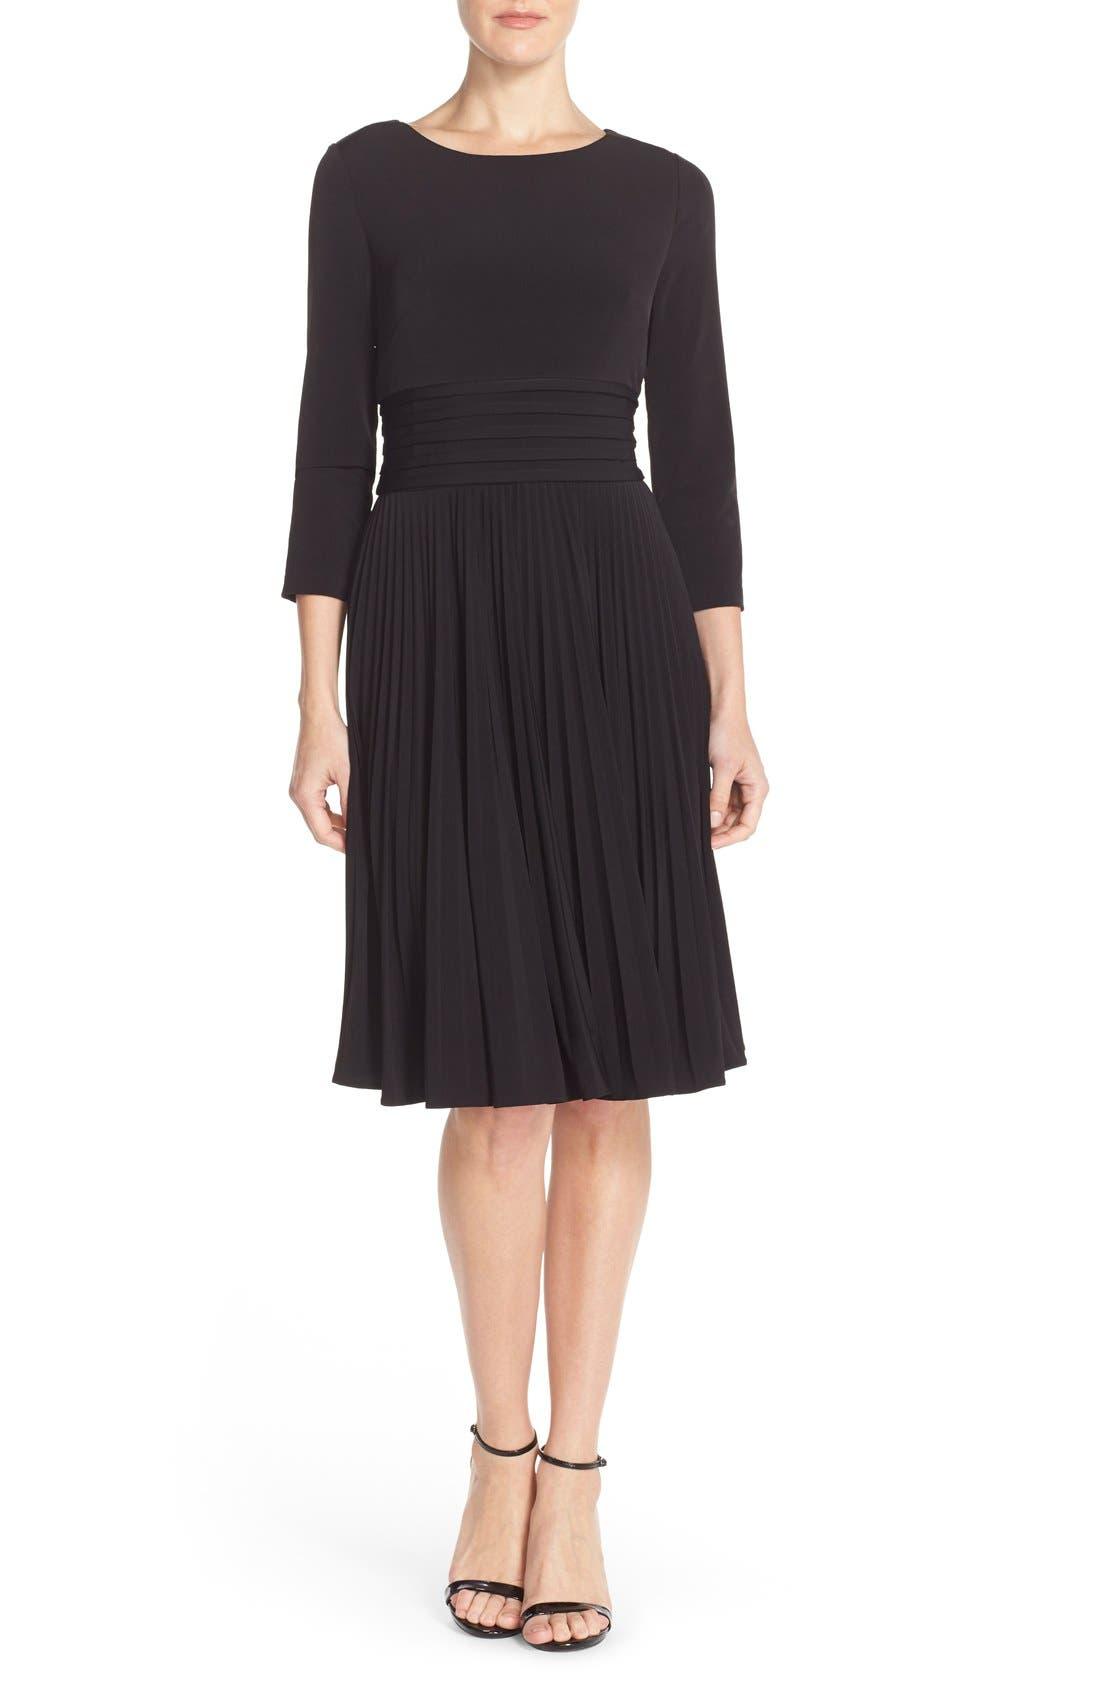 ELIZA J, Pleated Jersey Fit & Flare Dress, Alternate thumbnail 4, color, 001